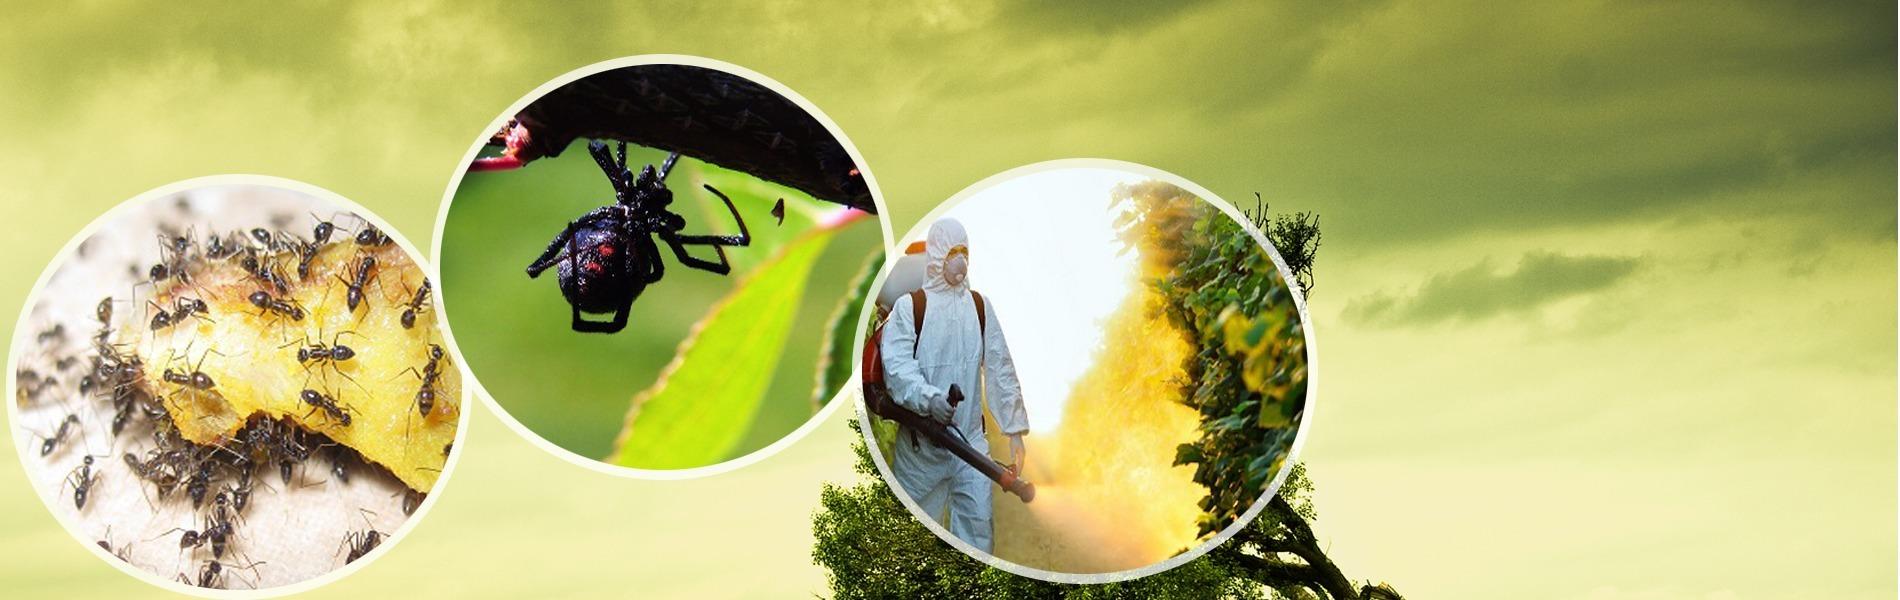 Eco Safe Pest Control Perth (@ecosafepestcontrolperth) Cover Image